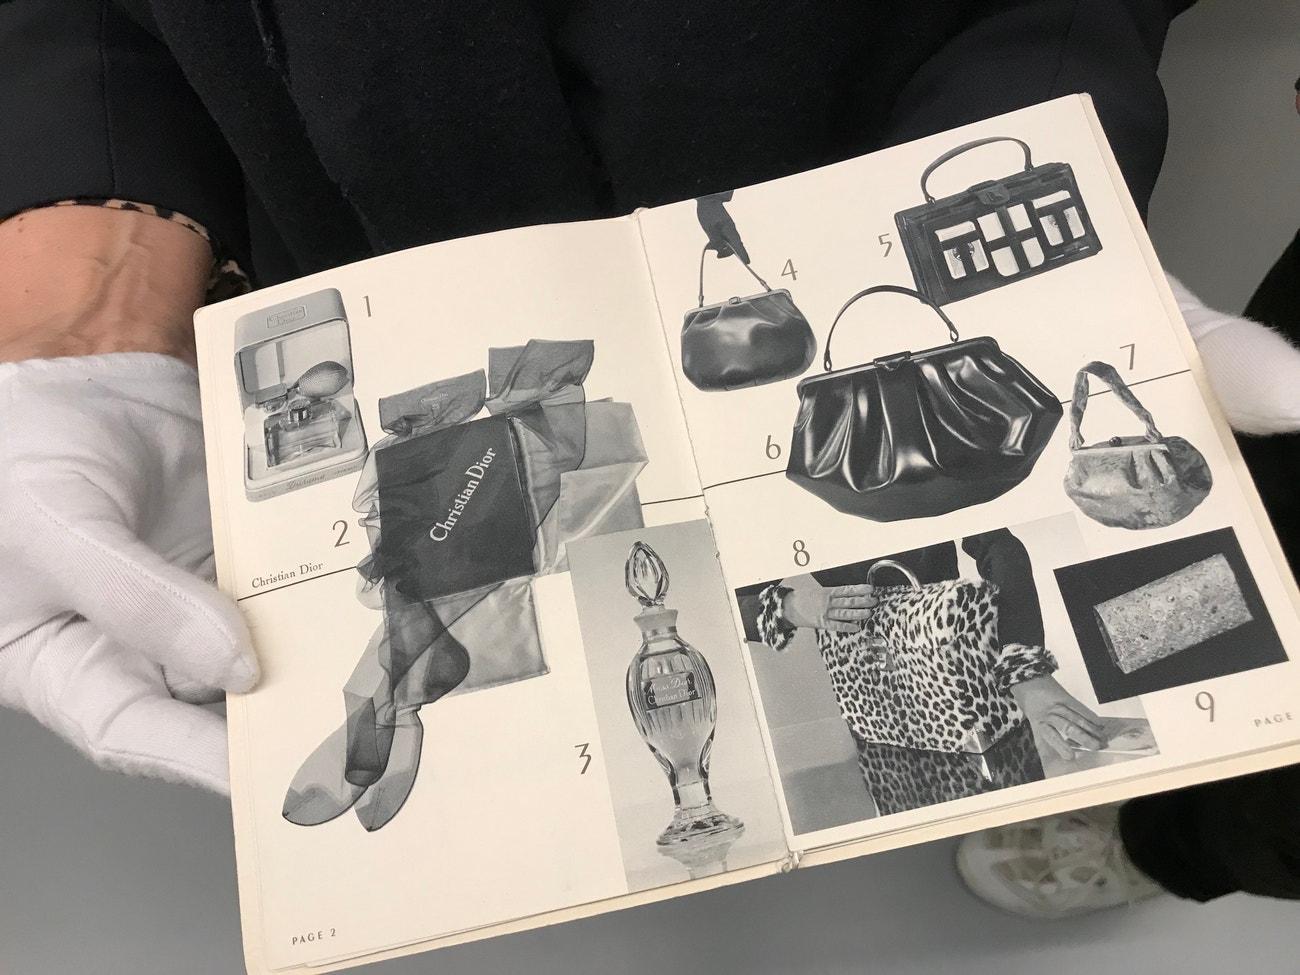 Katalog produktů Dior z prosince roku 1951